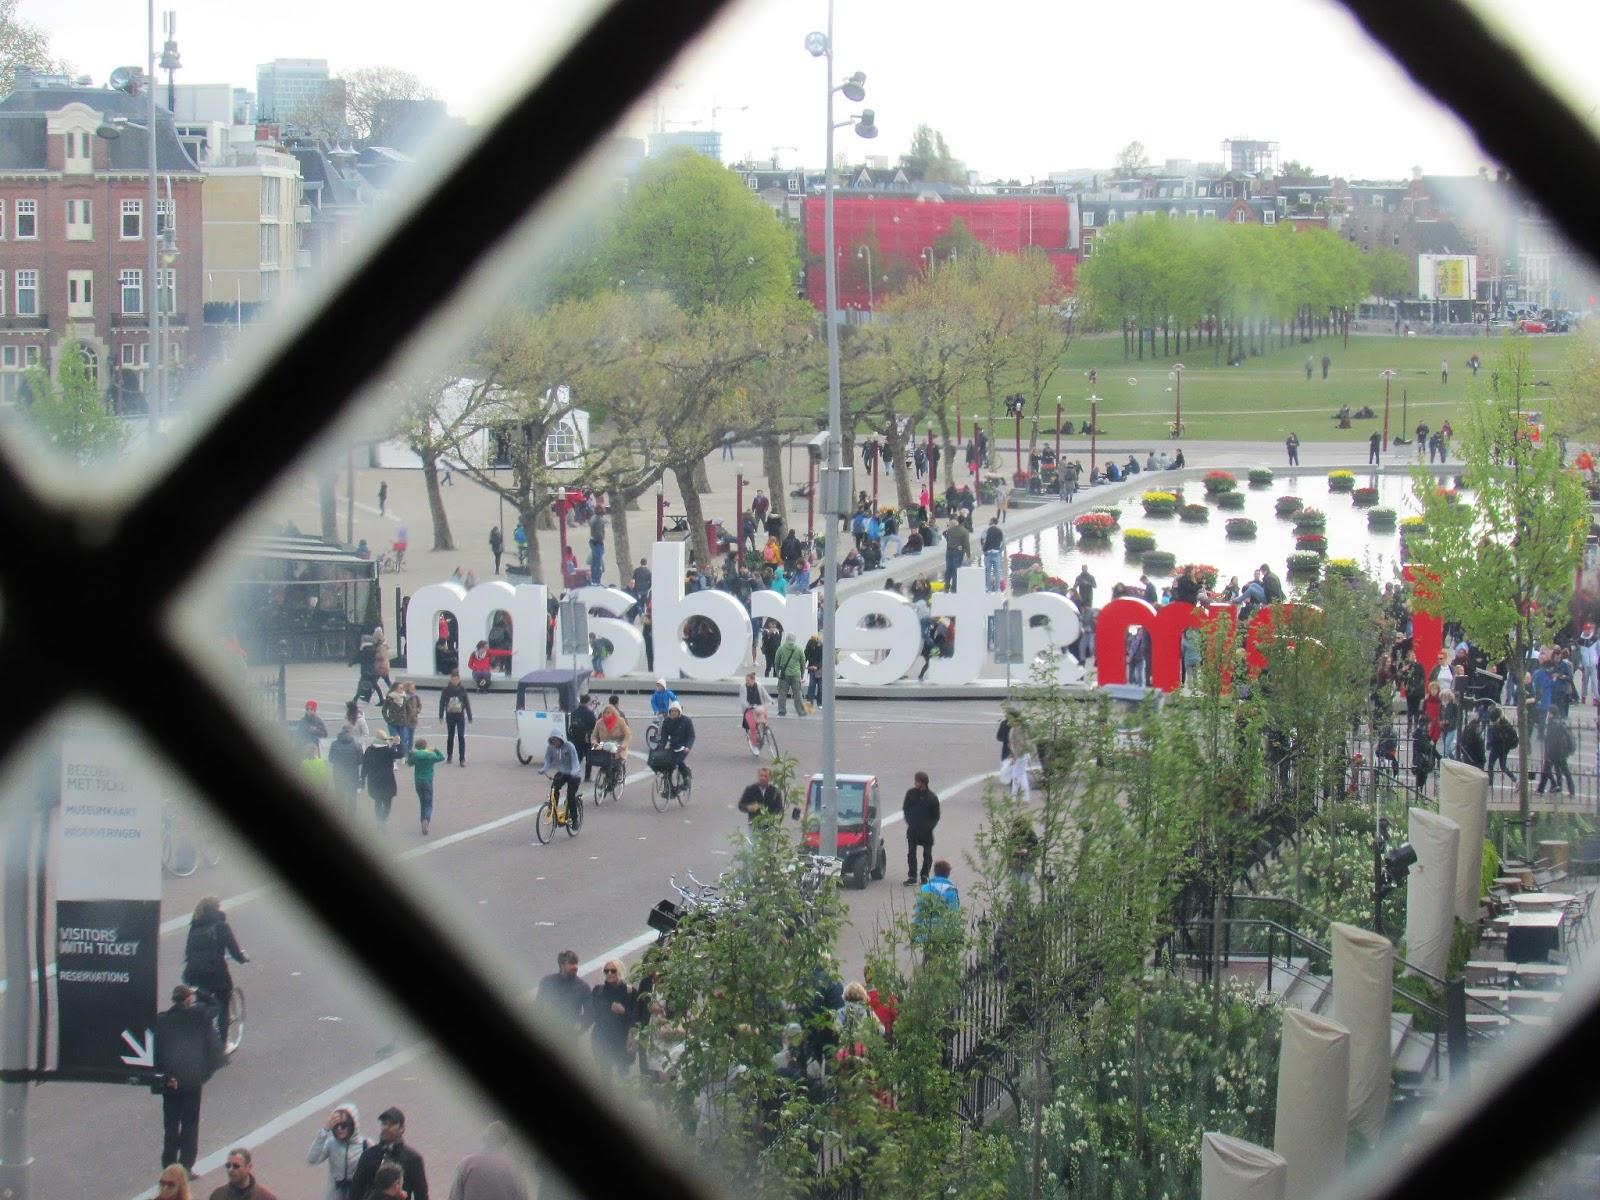 iamsterdam letters - Rijksmuseum, Amsterdam